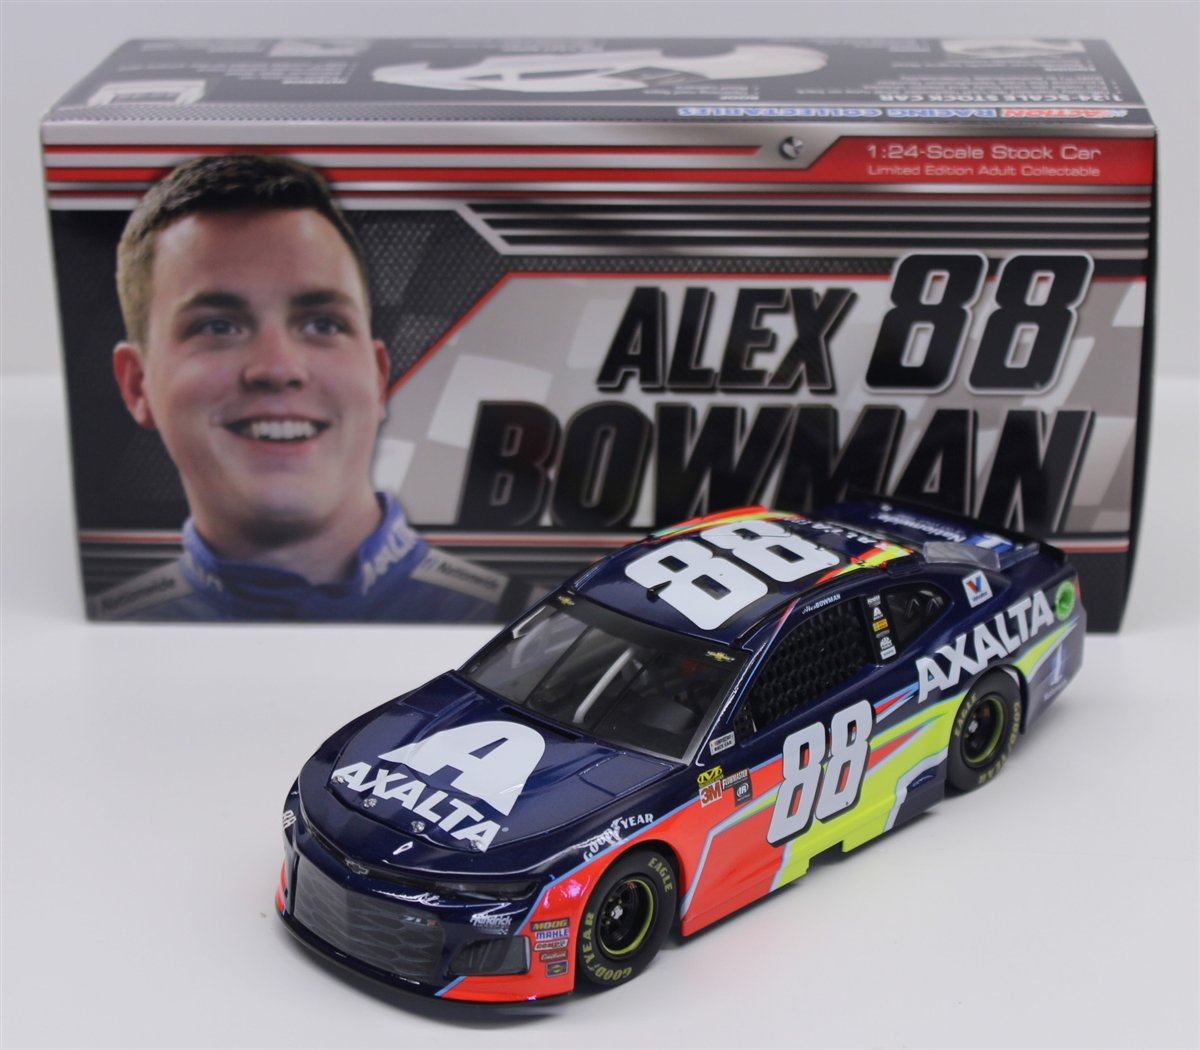 Lionel Racing Alex Bowman 2018 Axalta NASCAR Diecast 1 24 Scale